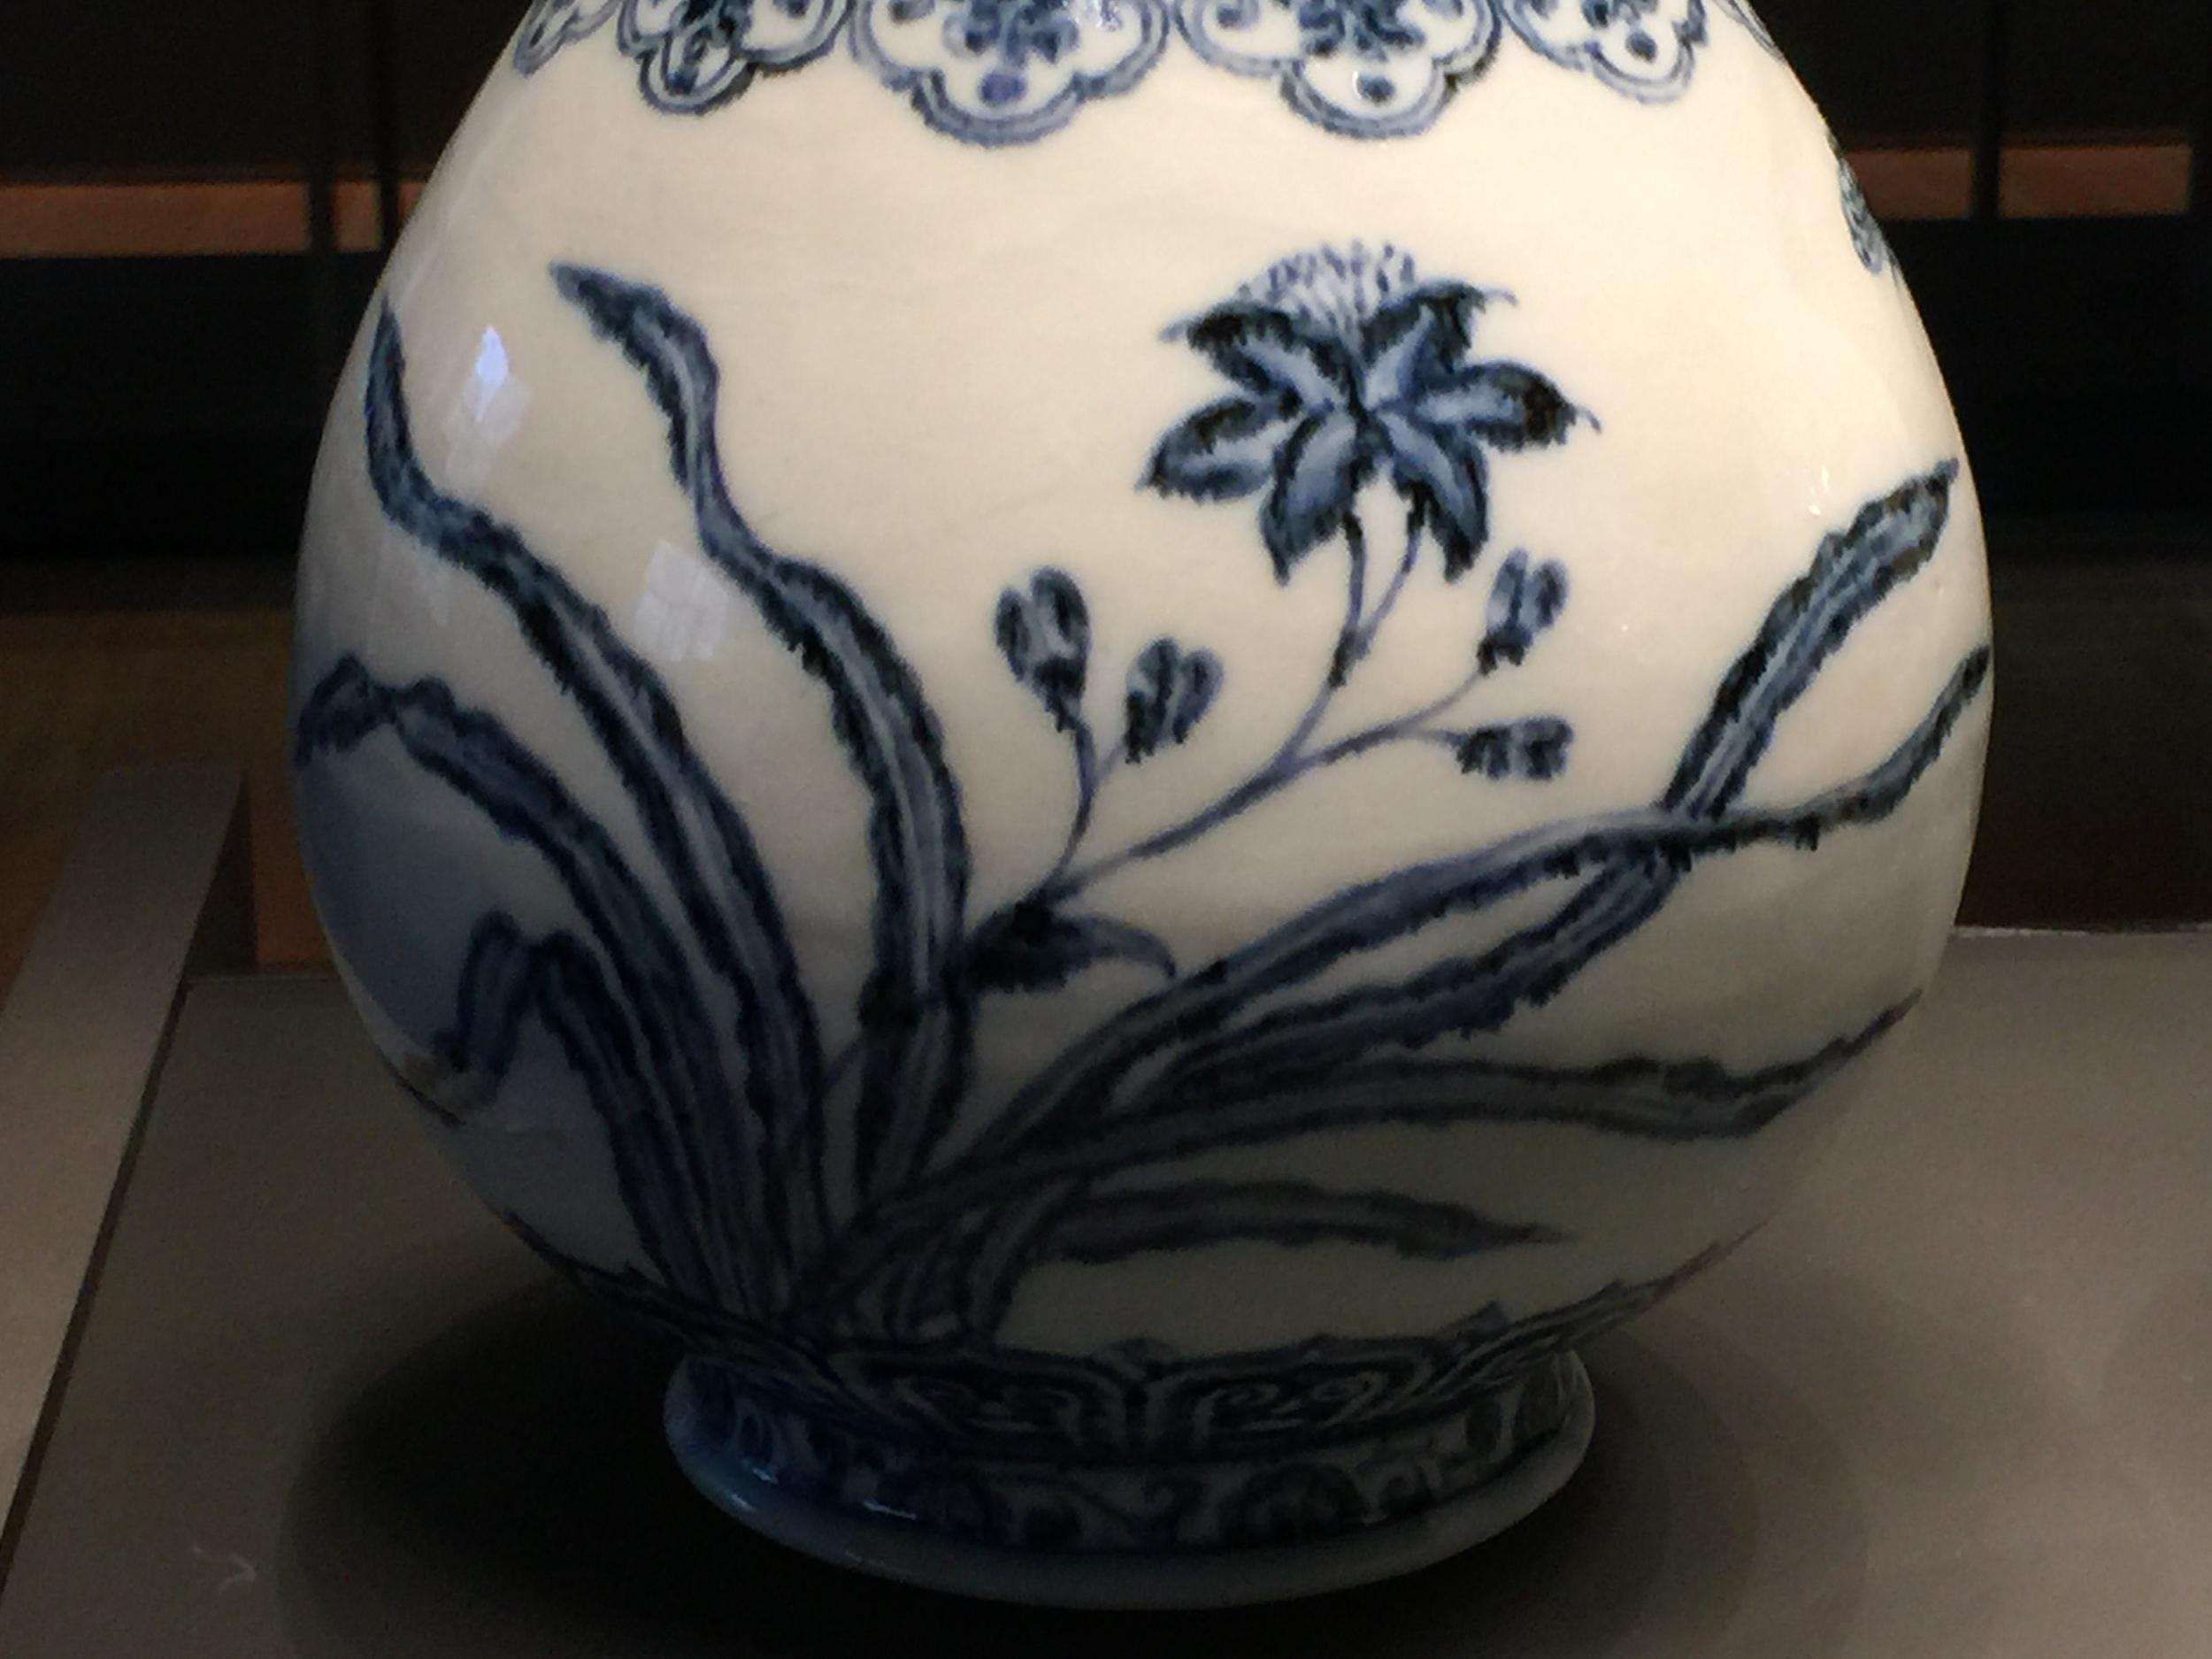 Chinese-Porcelain-British-Museum-Percival-David-jessewaugh.com-39.jpg